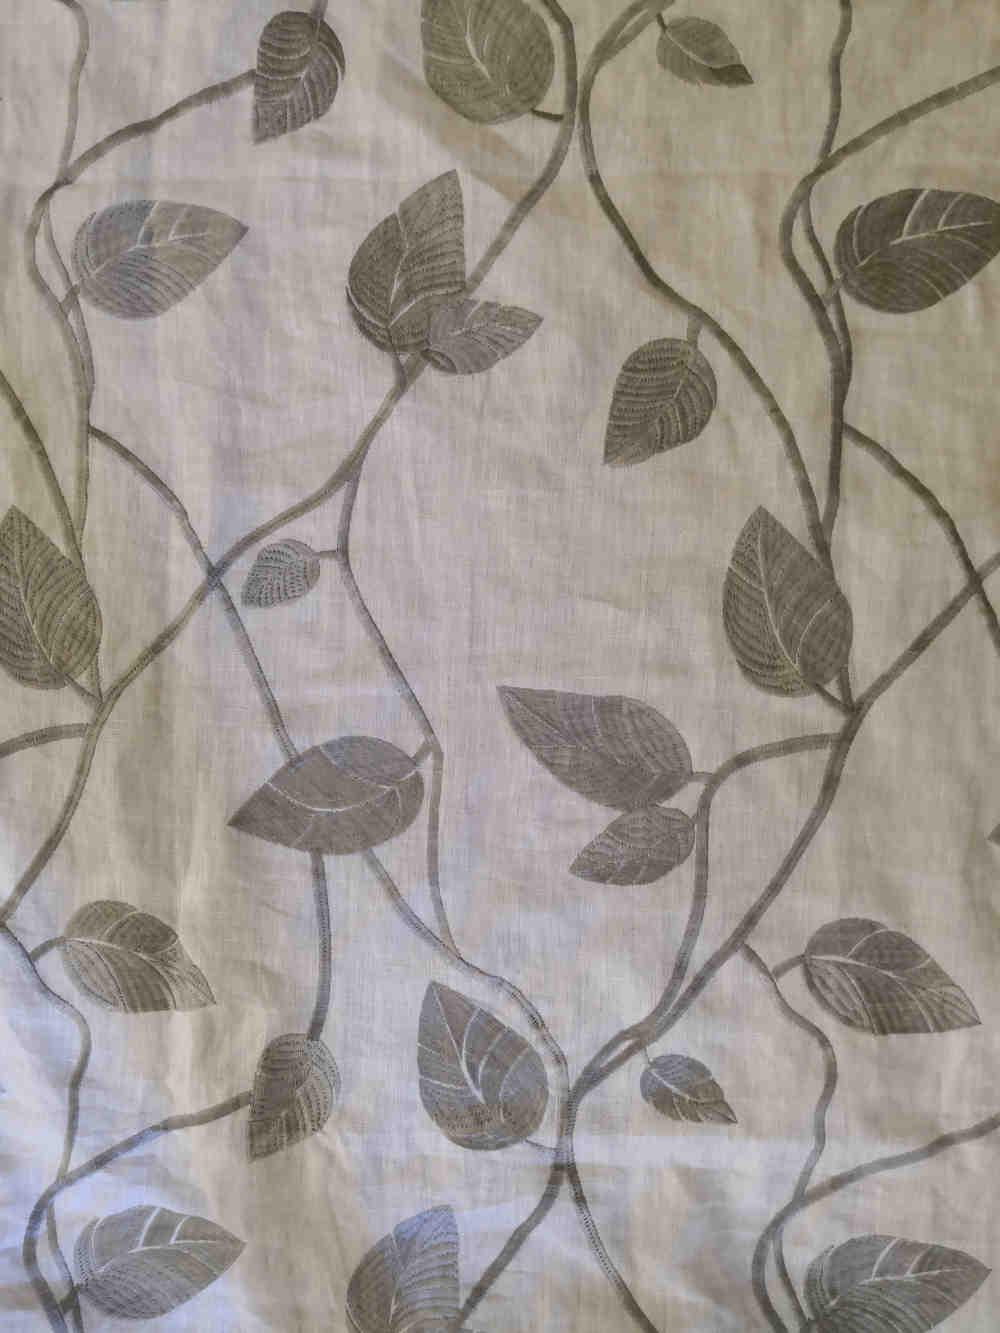 73.31368 Eltville grey linnen embroidert € 49.50